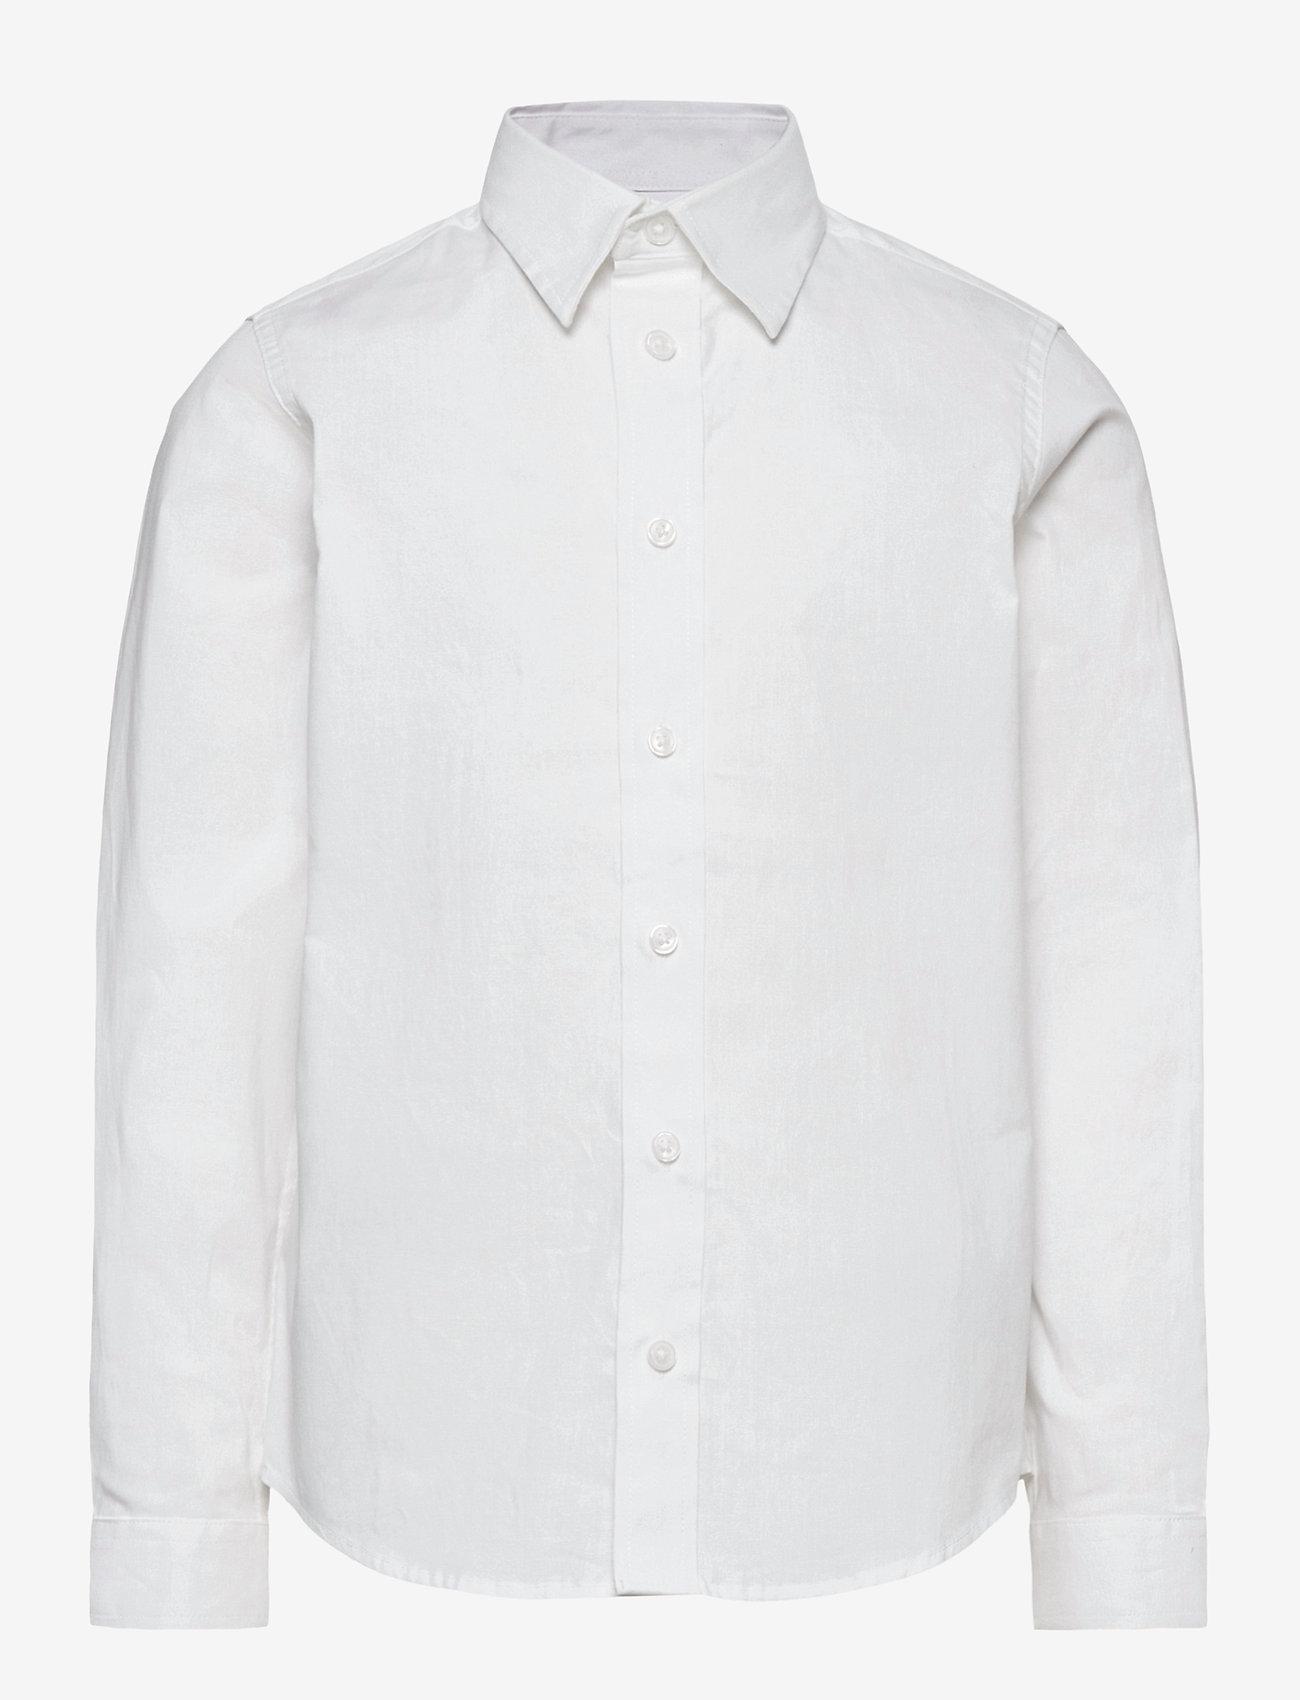 Jack & Jones - JJEMASON STRETCH SHIRT L/S ES21 JR - shirts - white - 0